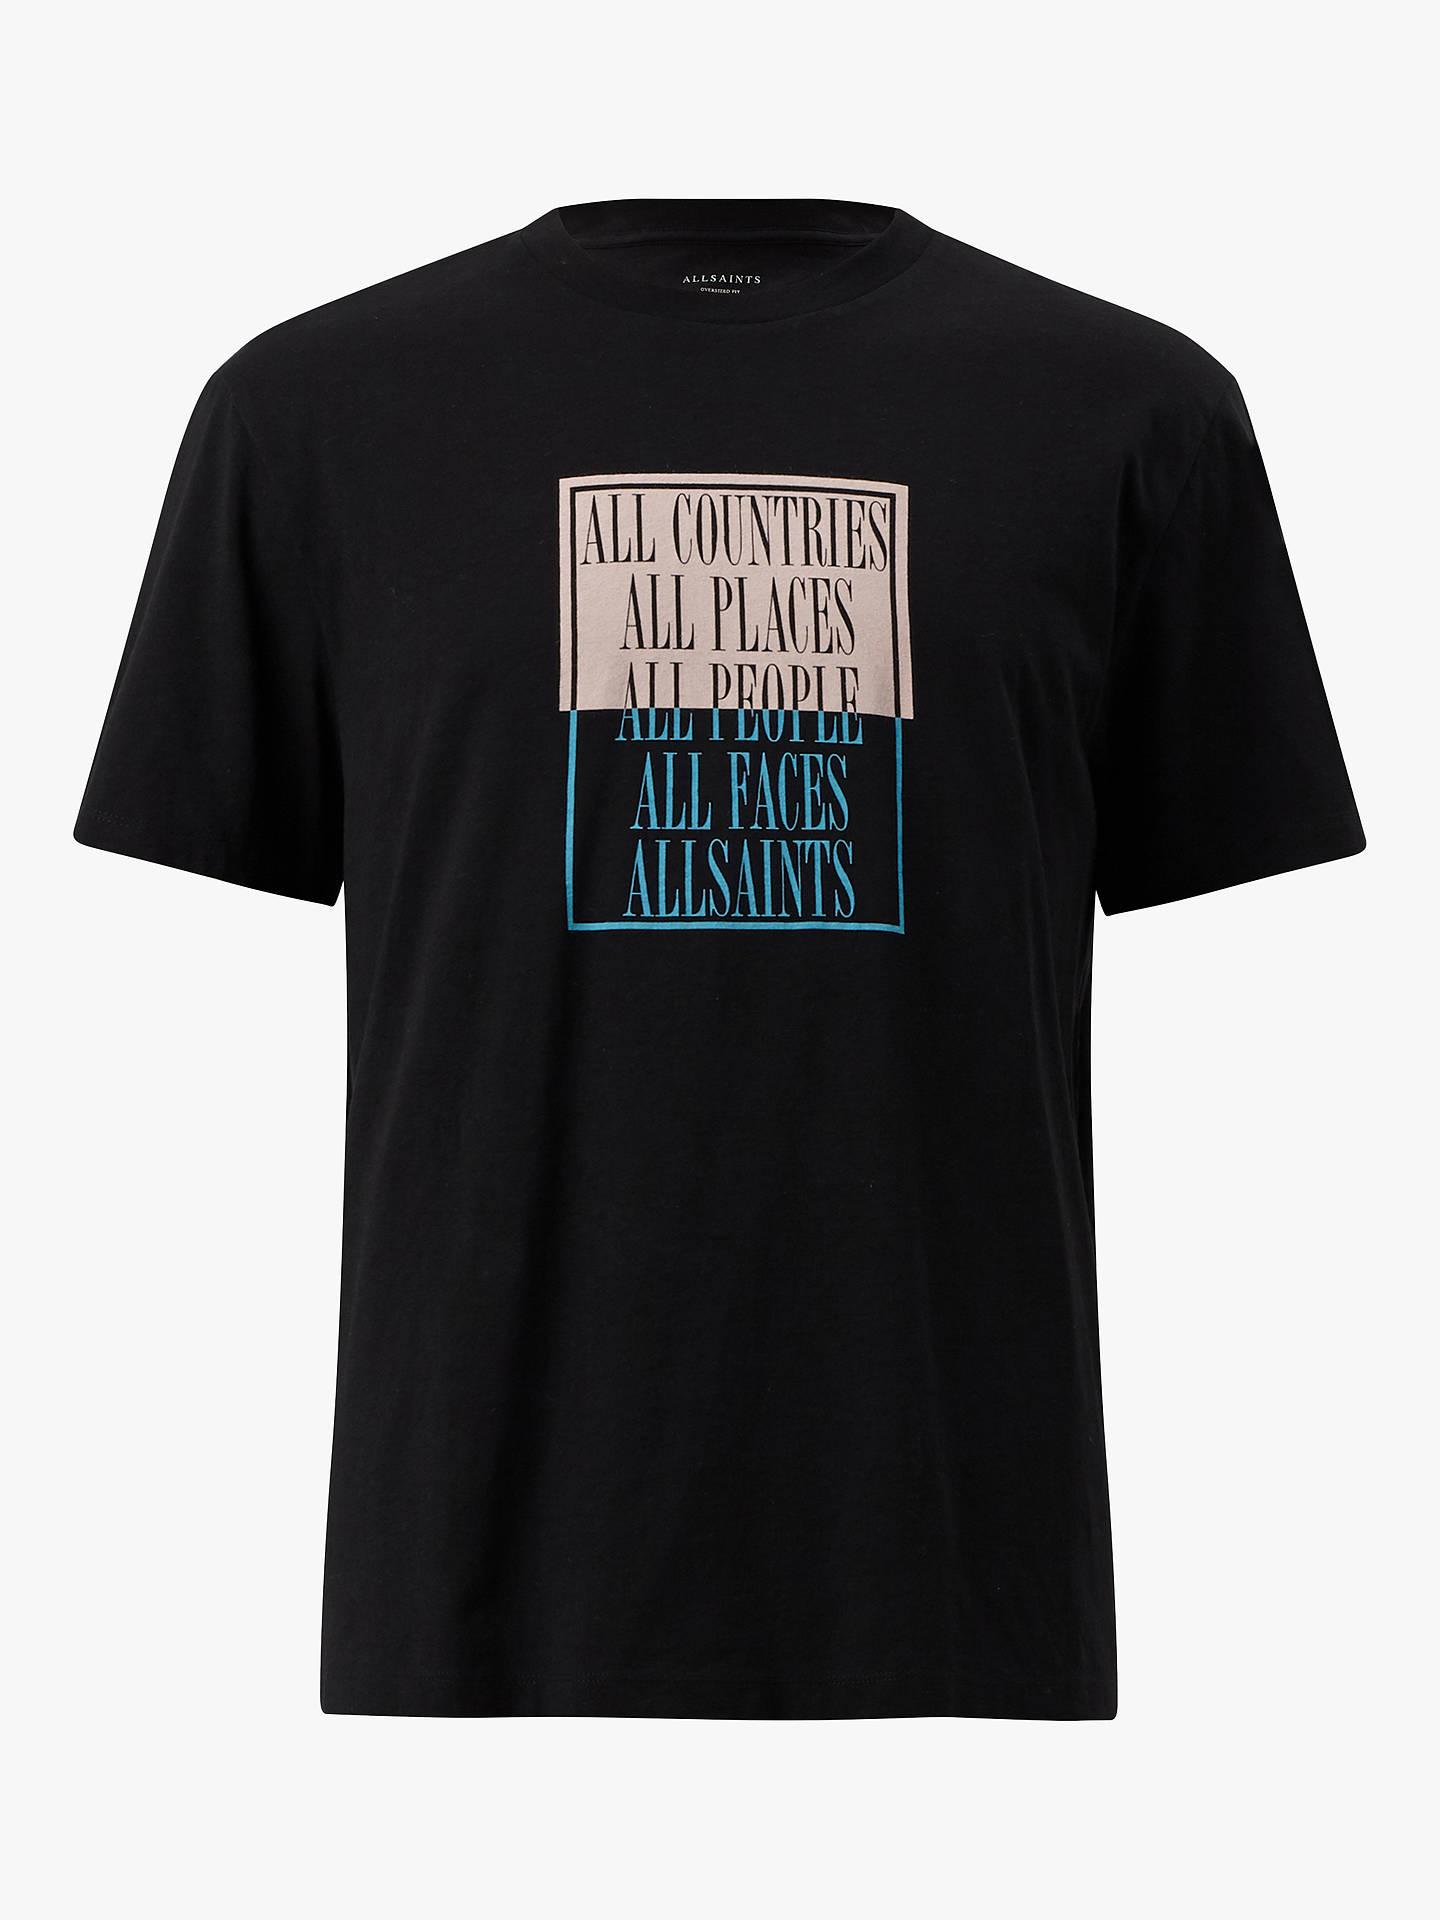 7a9254ef7 ... Buy AllSaints Embrace Graphic Crew T-Shirt, Jet Black, L Online at  johnlewis